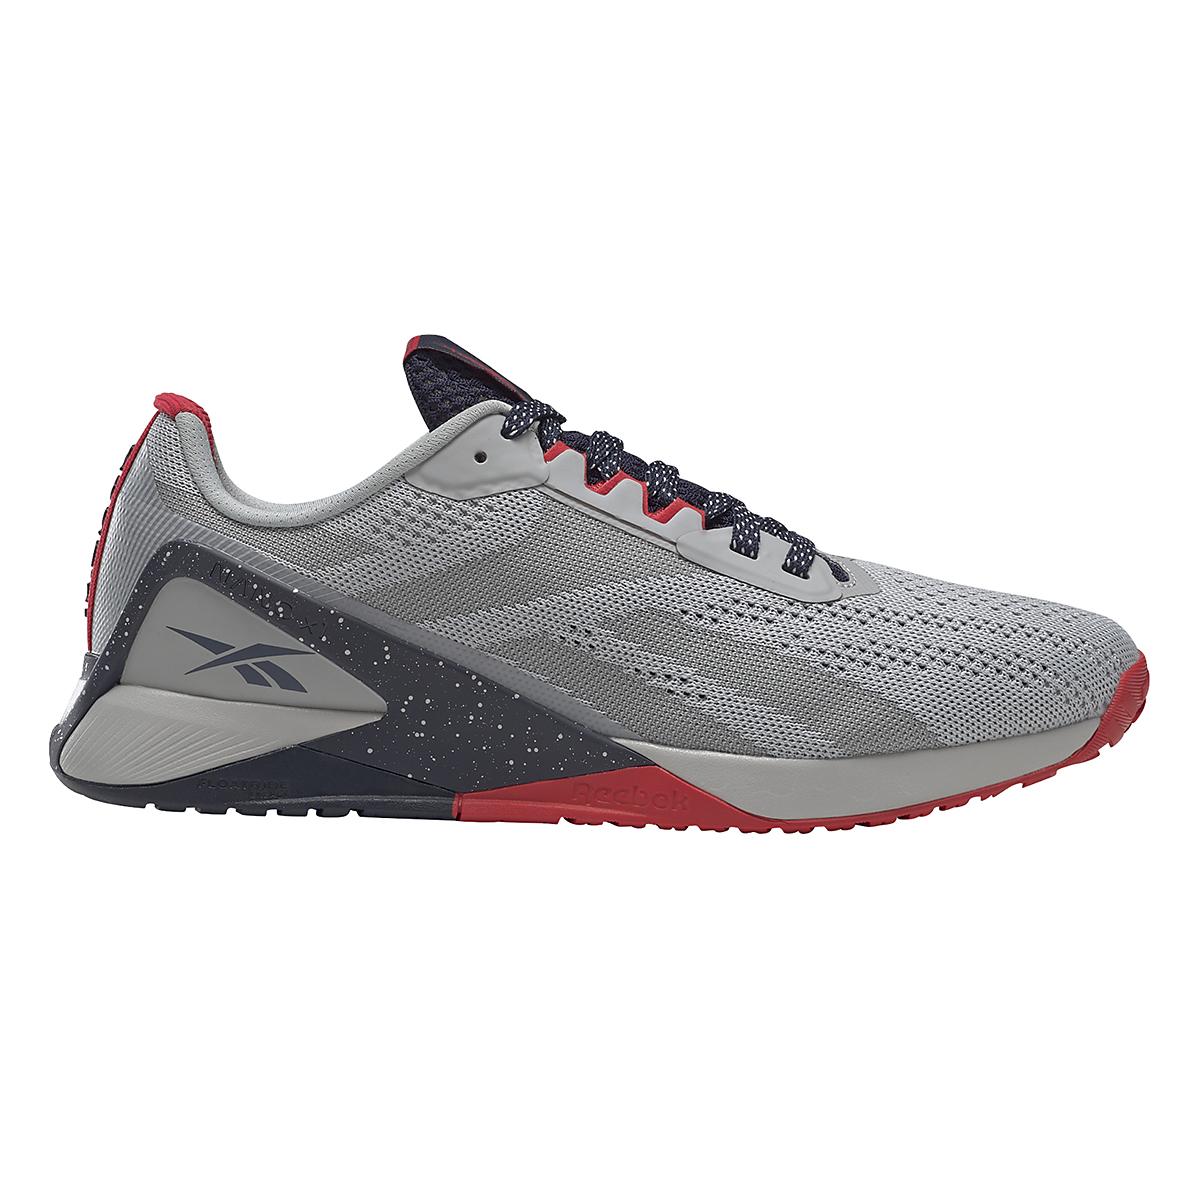 Men's Reebok Nano X1 Training Shoe - Color: Pure Grey/Vector Navy/Vector Red - JackRabbit Exclusive - Size: 8 - Width: Regular, Pure Grey/Vector Navy/Vector Red - JackRabbit Exclusive, large, image 1